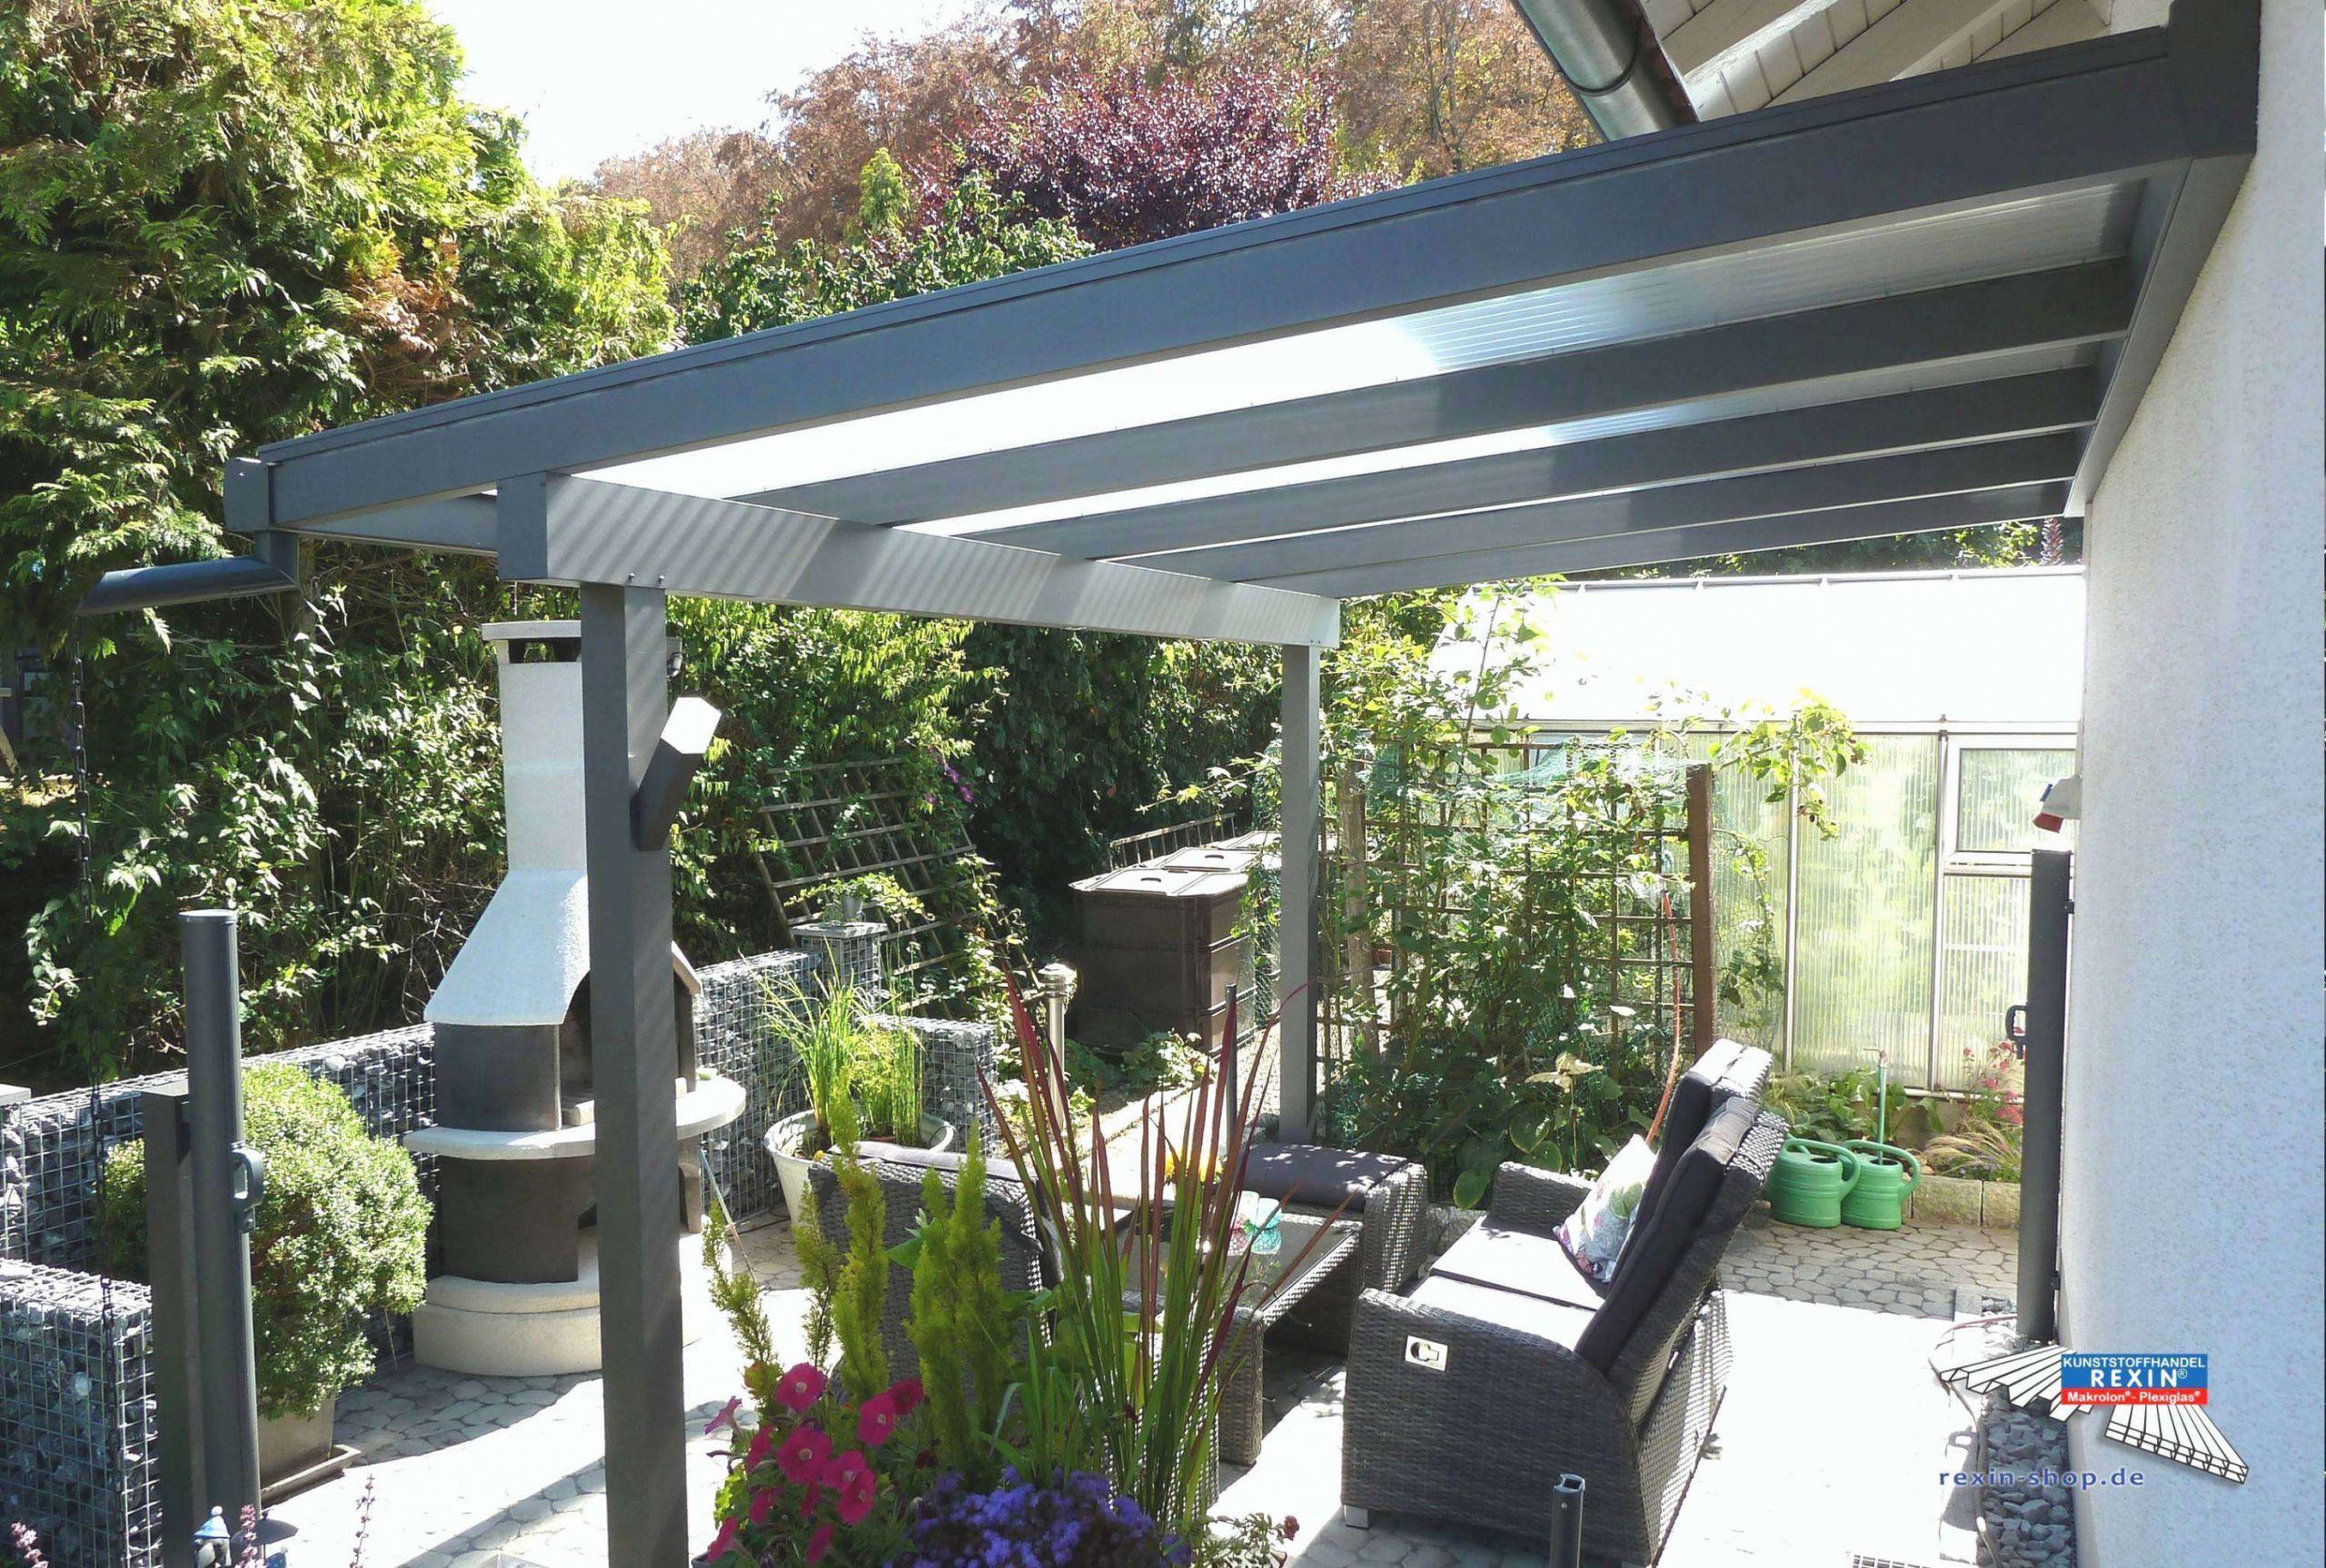 Deko Ideen Selber Machen Garten Best Of Gartendeko Selbst Gemacht — Temobardz Home Blog